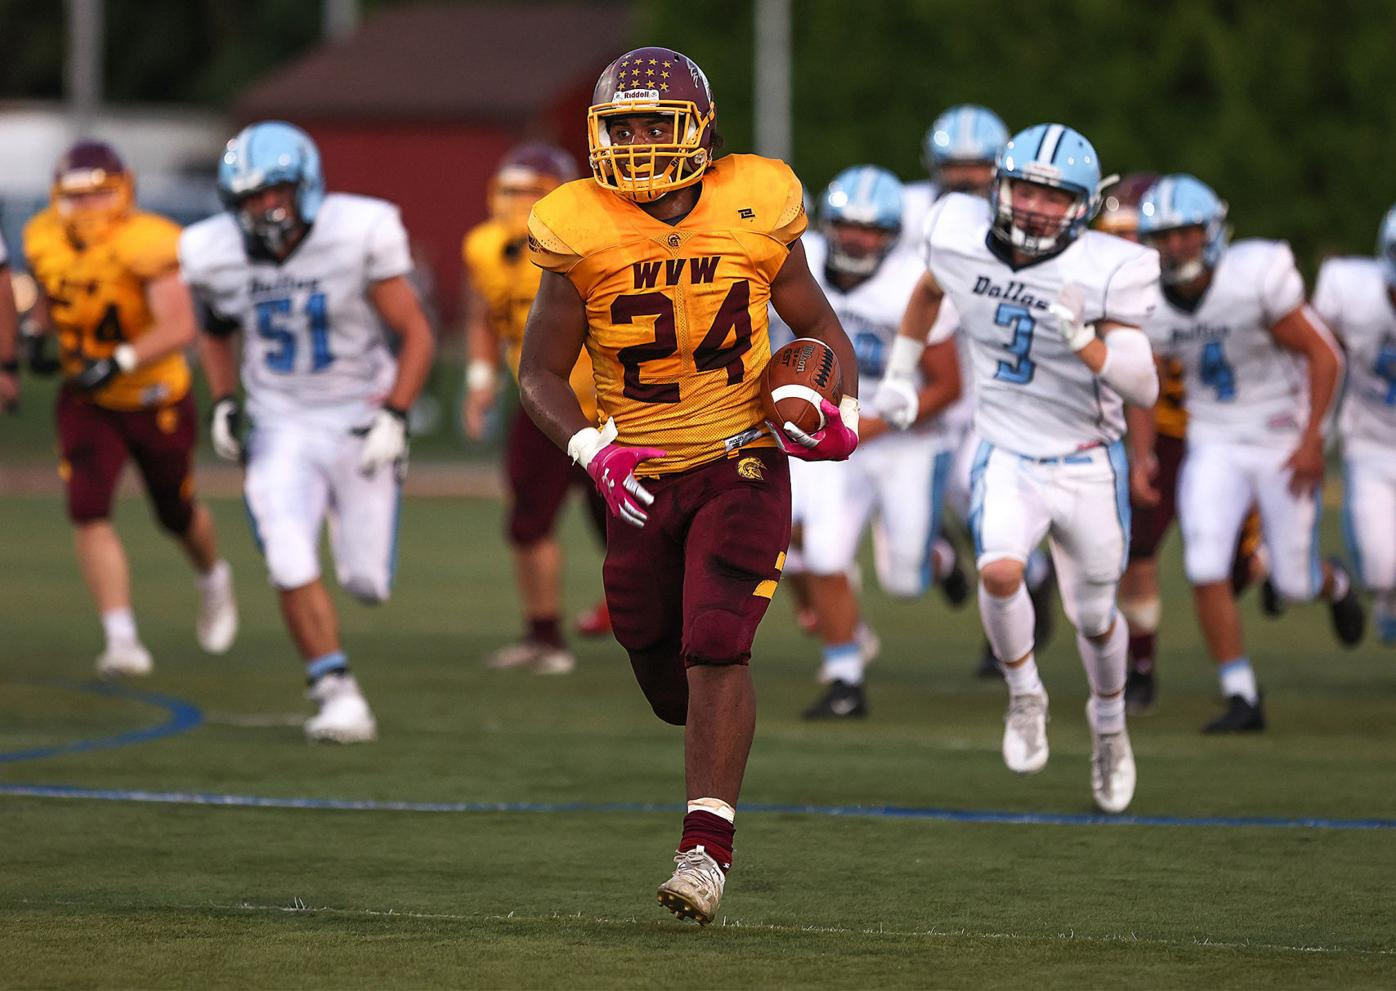 High School Football: Wyoming Valley West vs Dallas